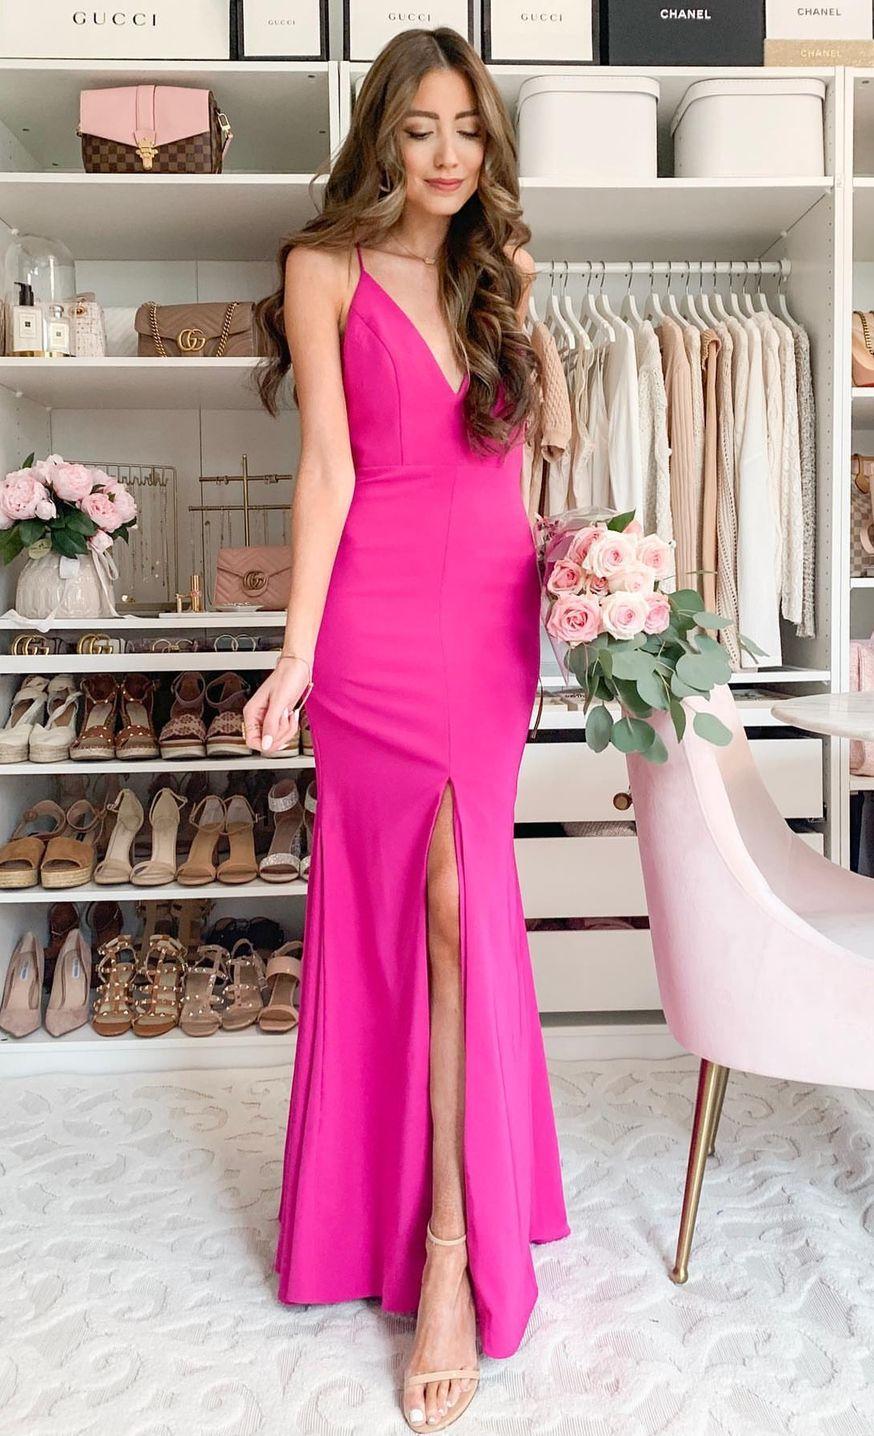 40 Beautiful Summer Wedding Guest Dresses You Ll Want To Copy In 2021 Wedding Guest Dress Summer Black Tie Wedding Guest Dress Summer Black Tie Wedding Guest Dress [ 1436 x 874 Pixel ]